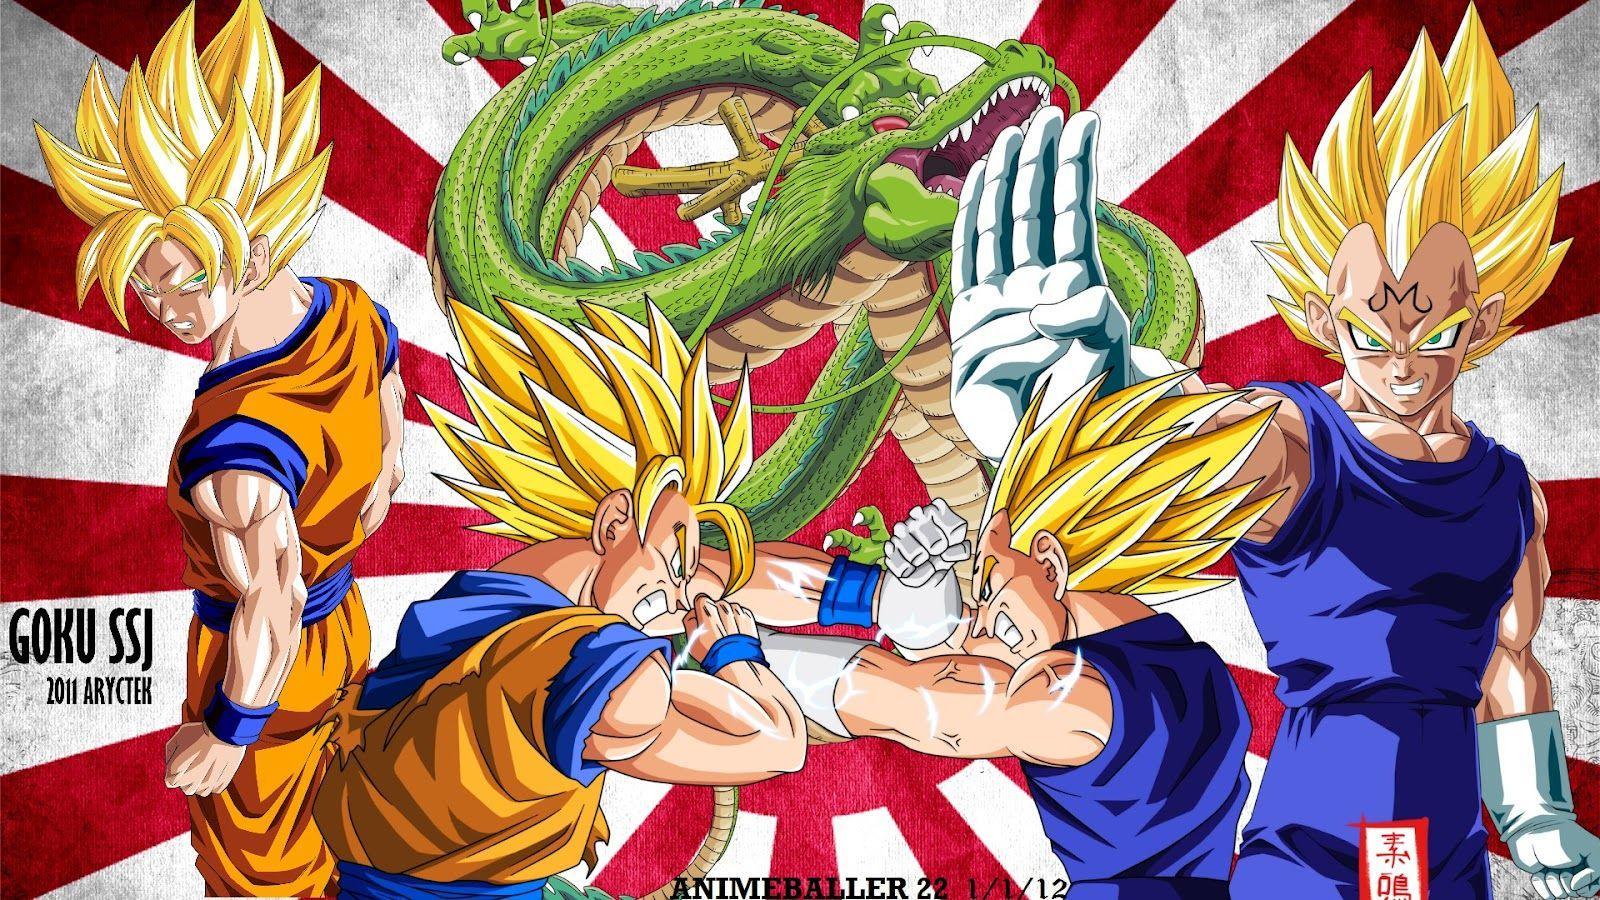 Dragon Ball Z Goku Vs Vegeta Wallpapers Wallpaper Cave